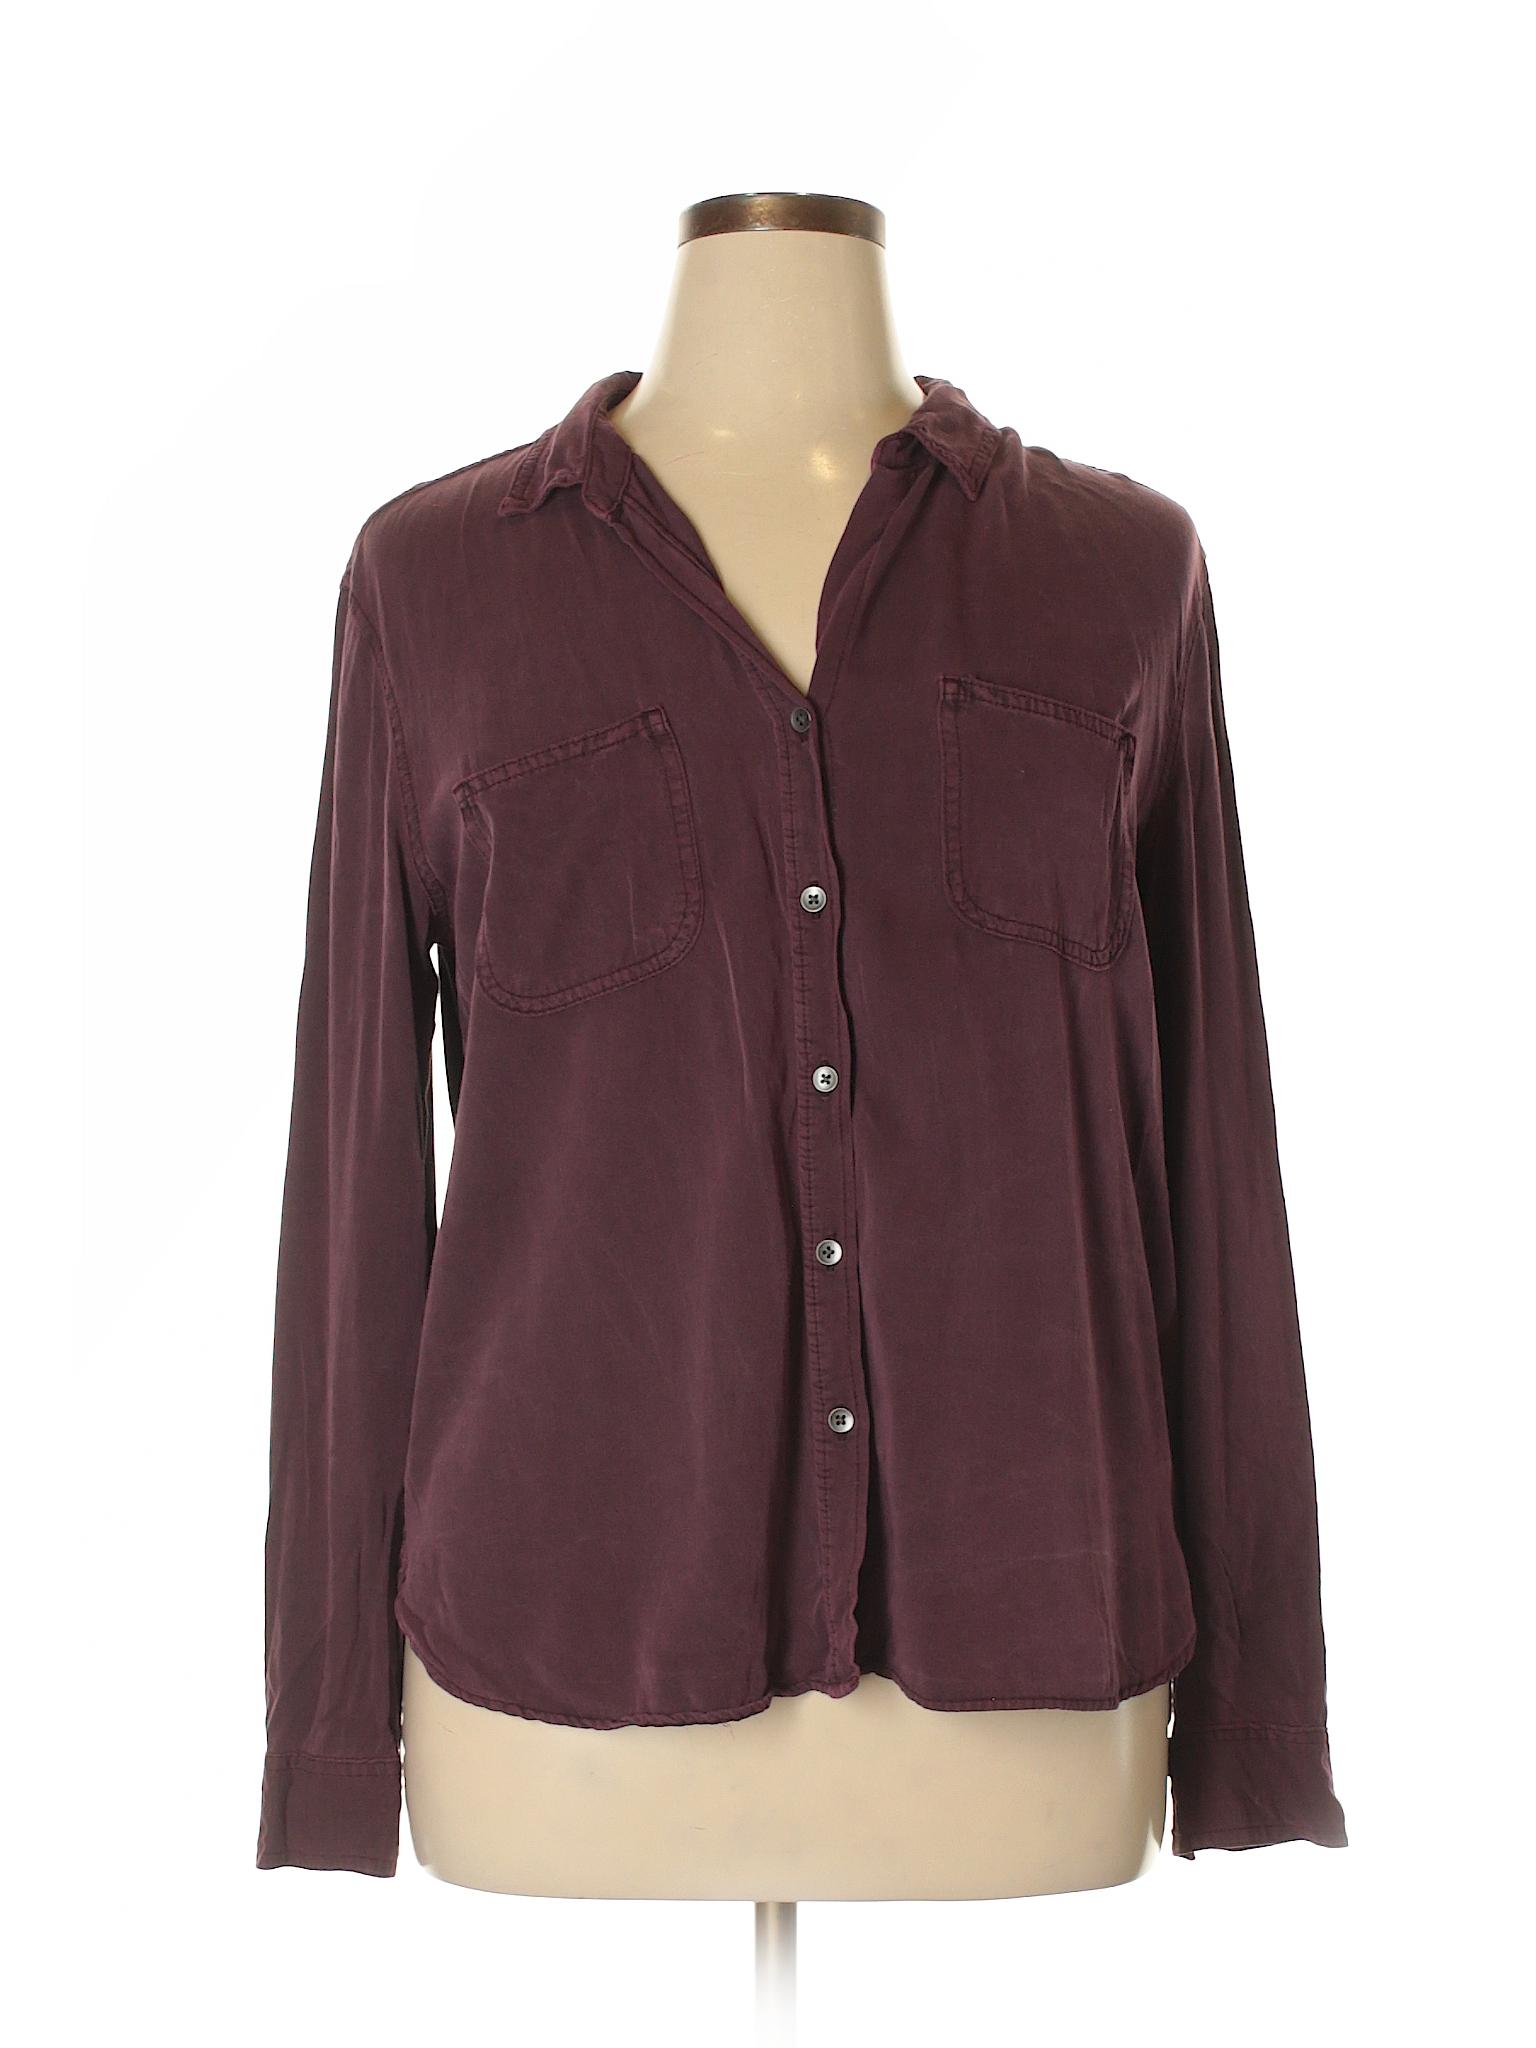 rock republic 100 rayon solid burgundy long sleeve button down shirt size xl 83 off thredup. Black Bedroom Furniture Sets. Home Design Ideas